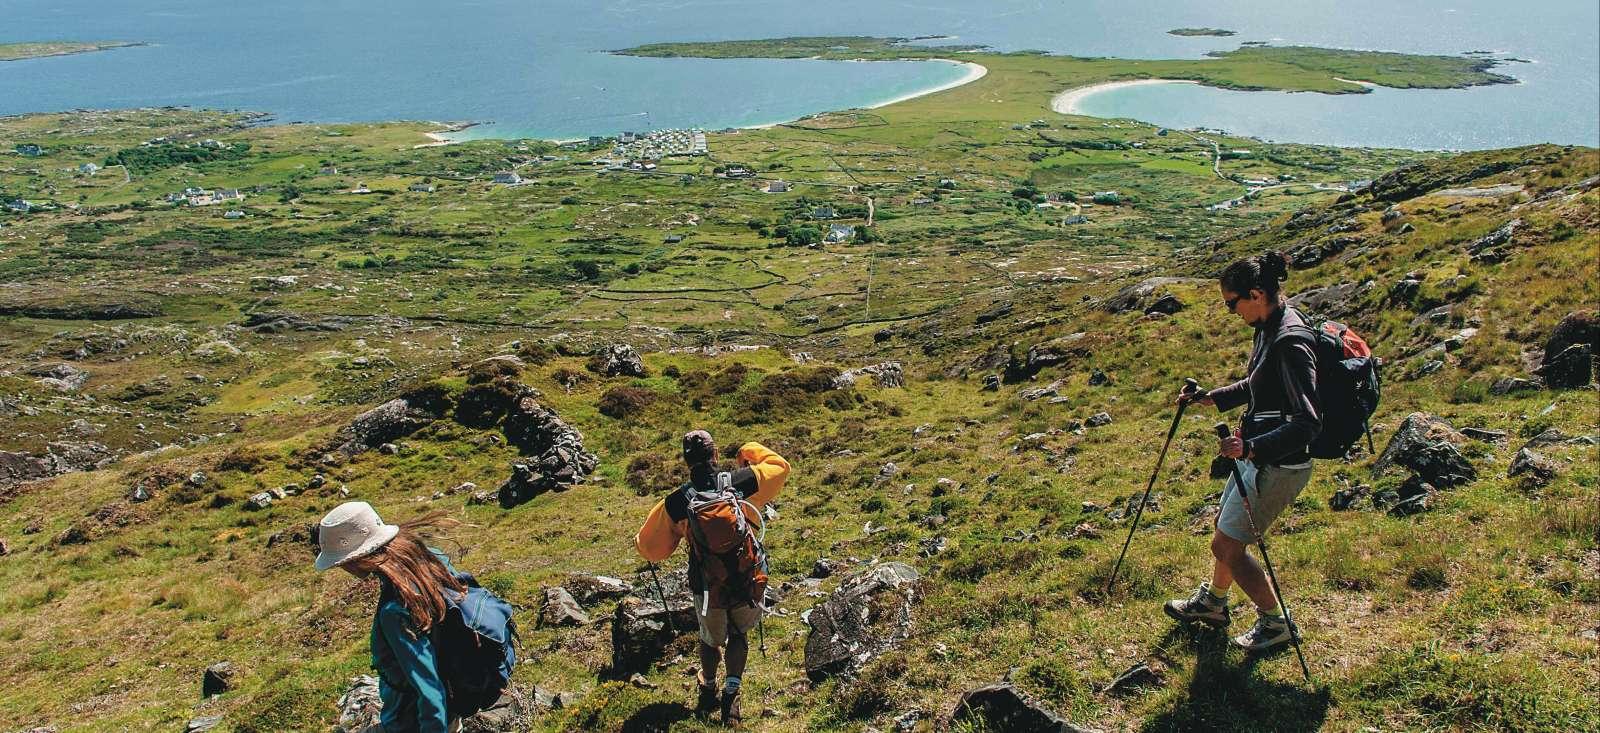 Voyage à pied Irlande : Connemara et Iles Atlantiques